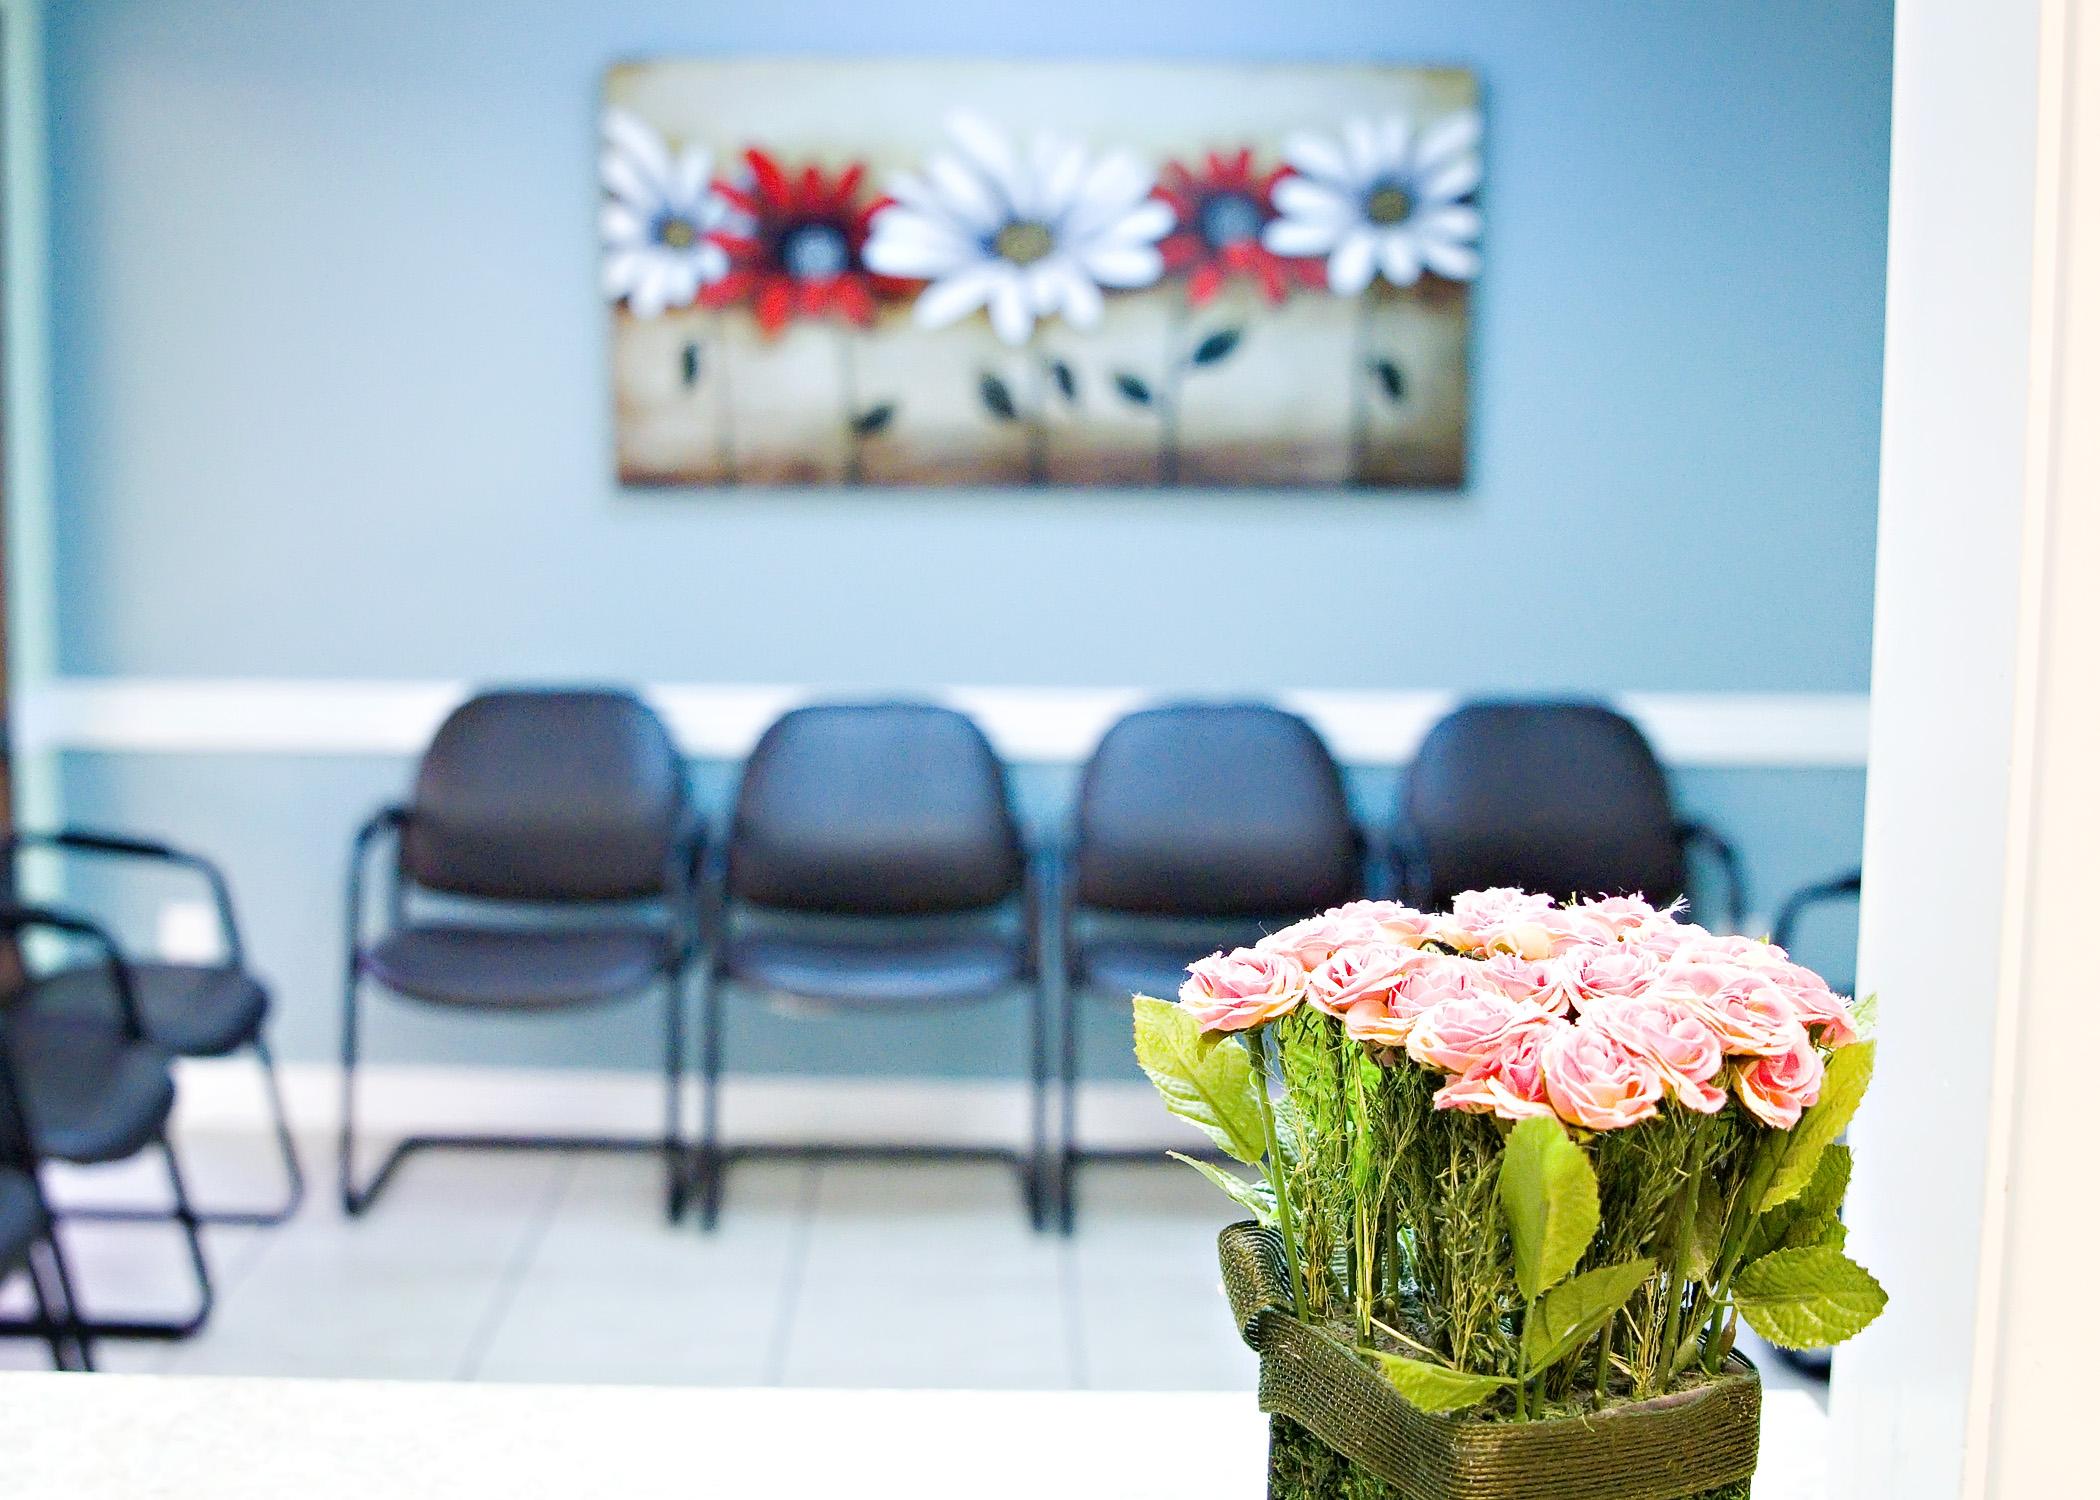 Luis Castillo Professional Dental Corp   5359 N Fresno St, Fresno, CA, 93710   +1 (559) 221-0302